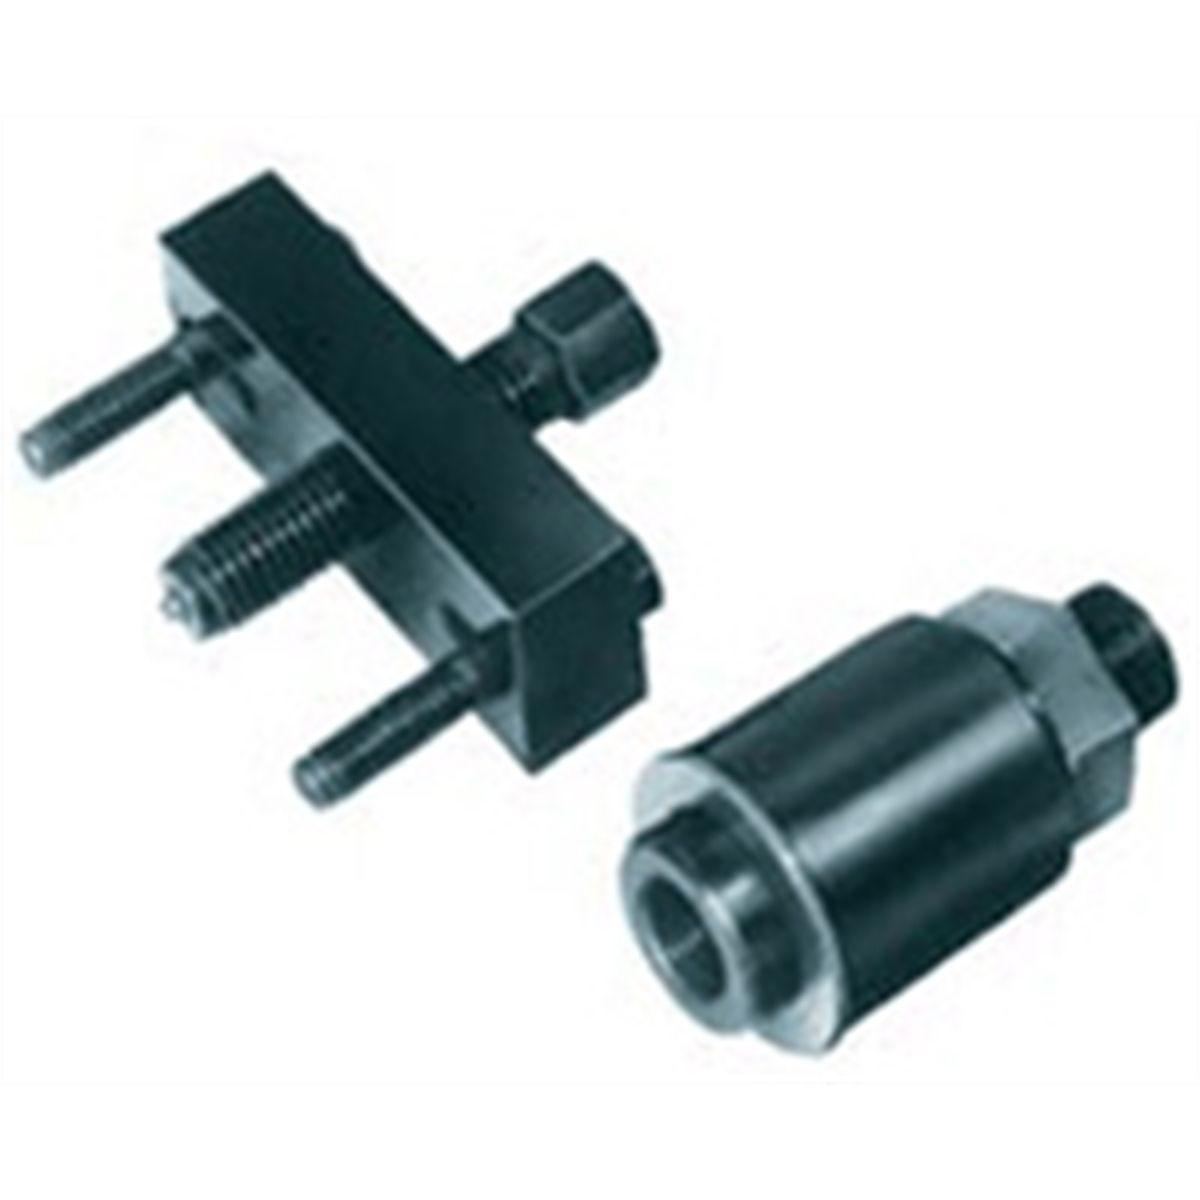 Otc Puller Parts : Otc drive pulley puller and installer set ot